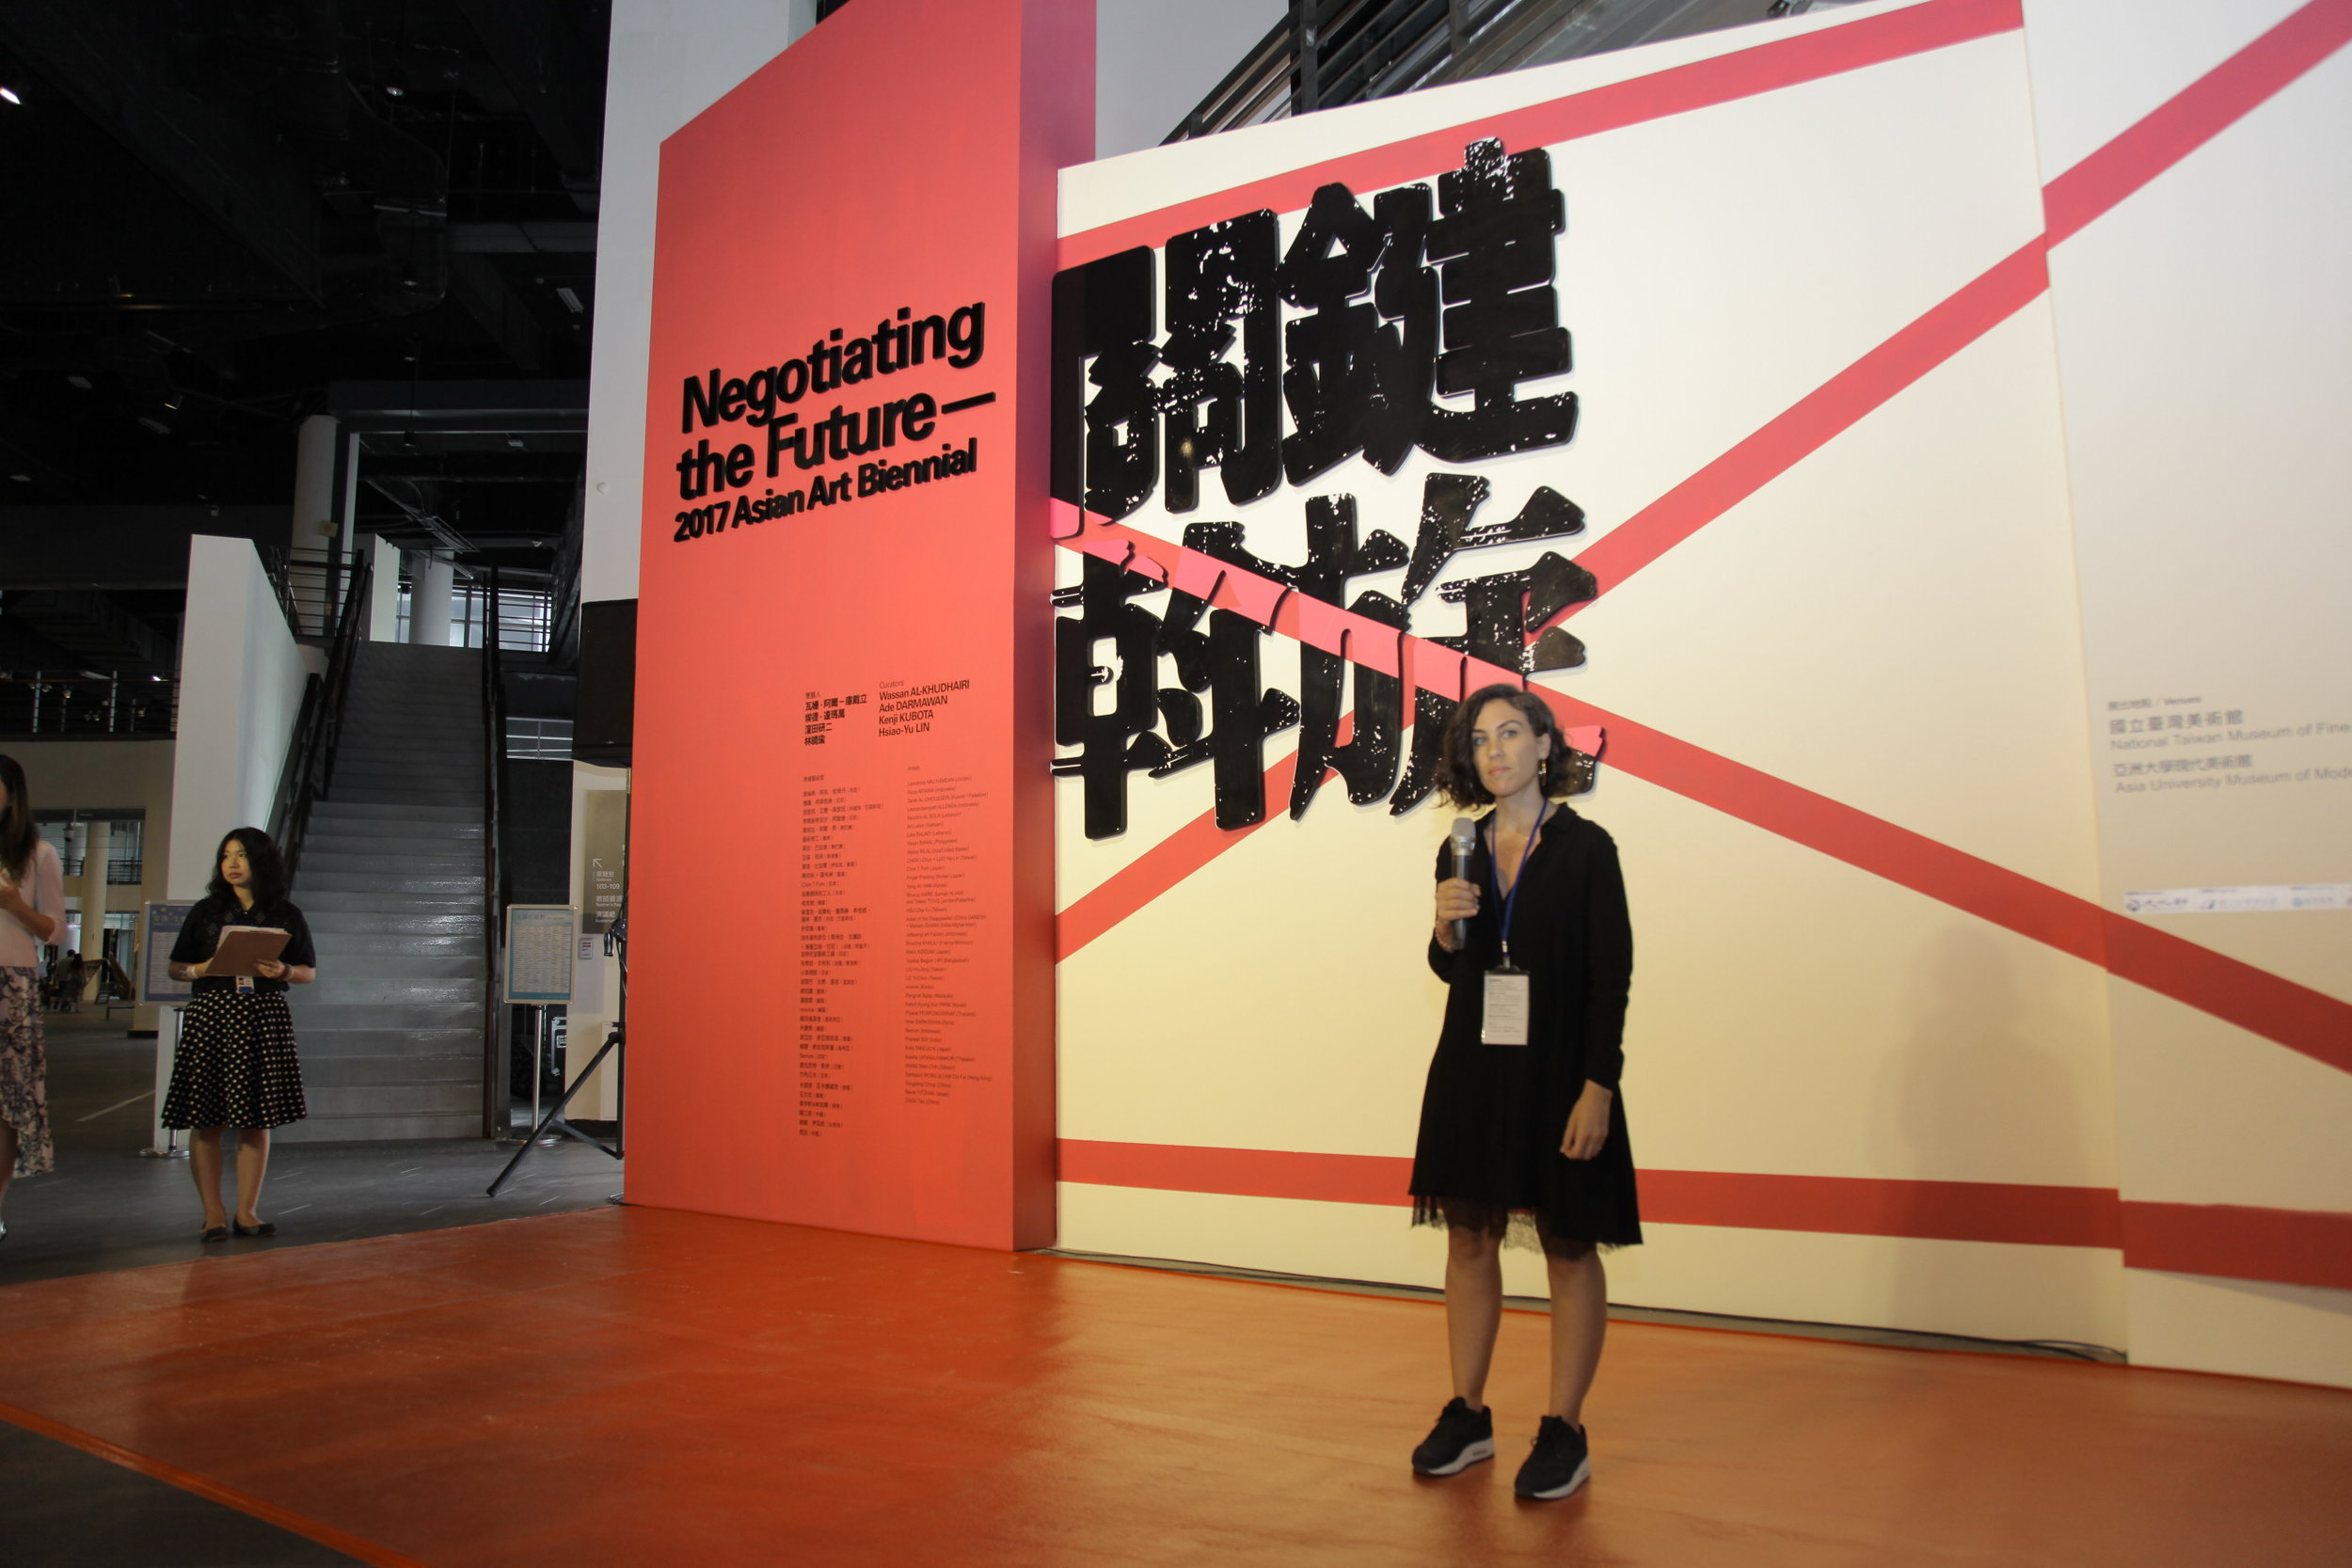 Wassan Al-Khudhairi speaking at the Asian Art Biennial, 2017. Photo by Orlando V Thompson II.